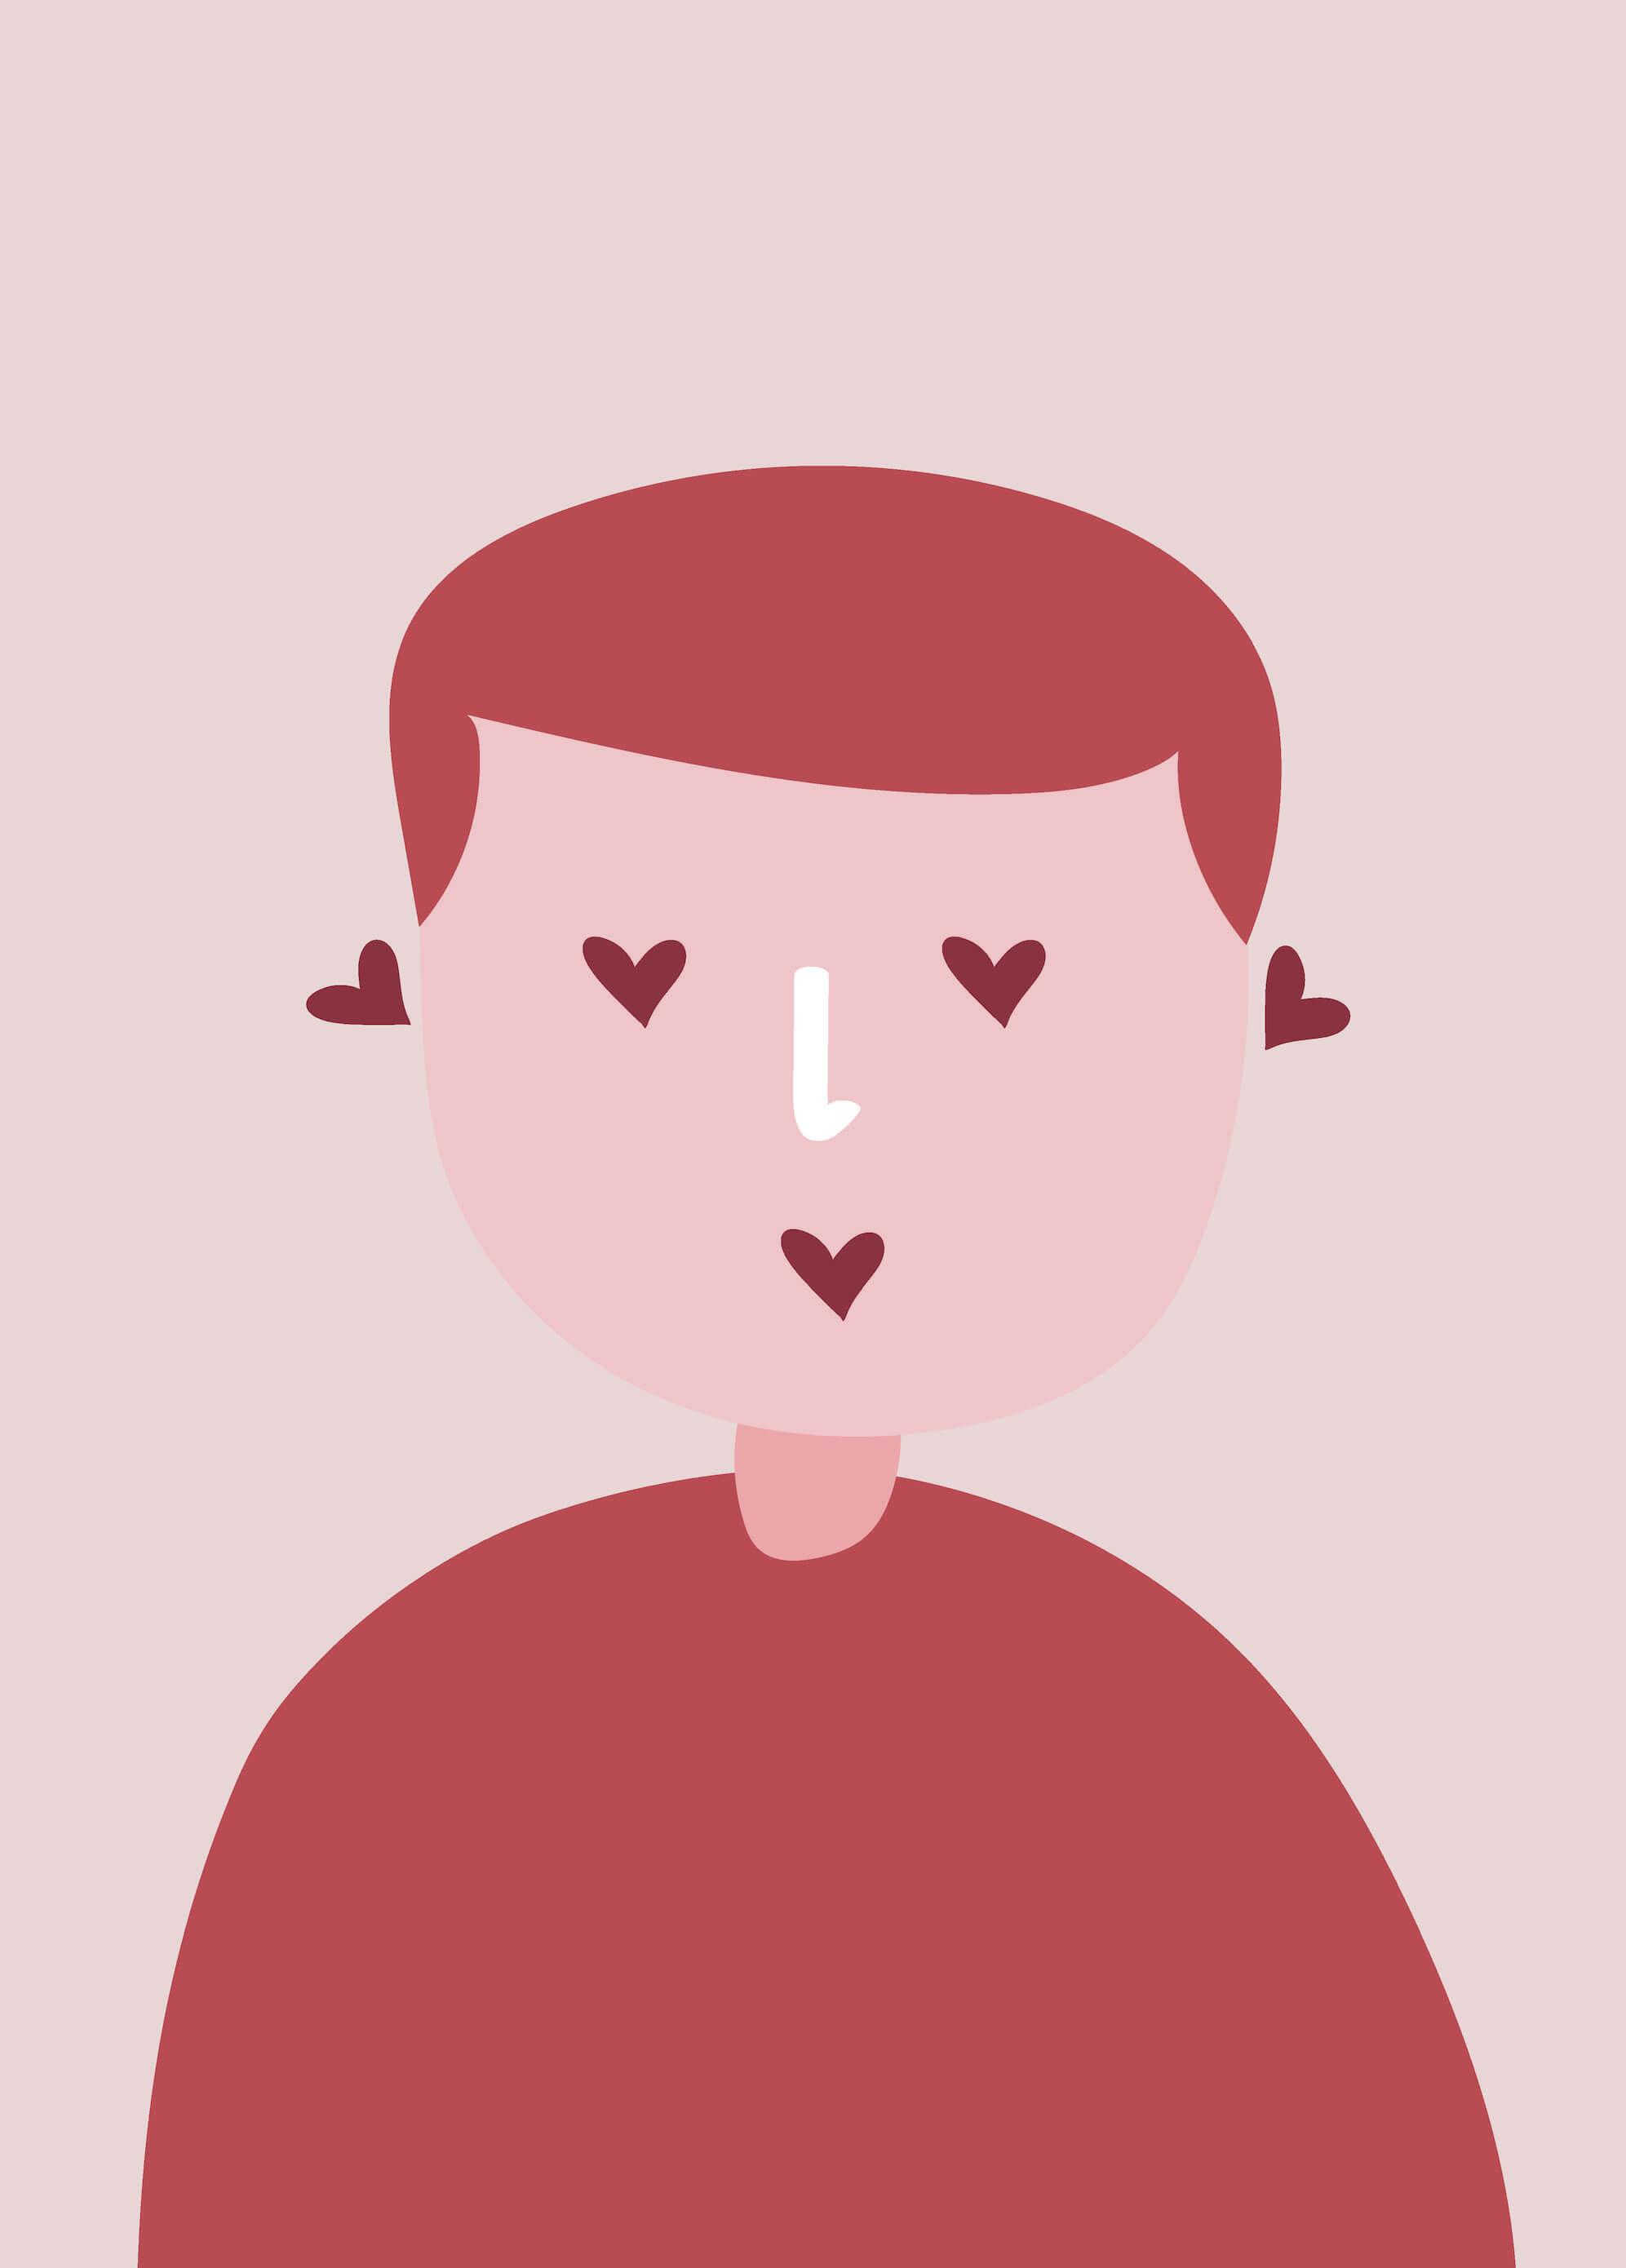 Speak Love, Hear Love, See Love (no text) main image